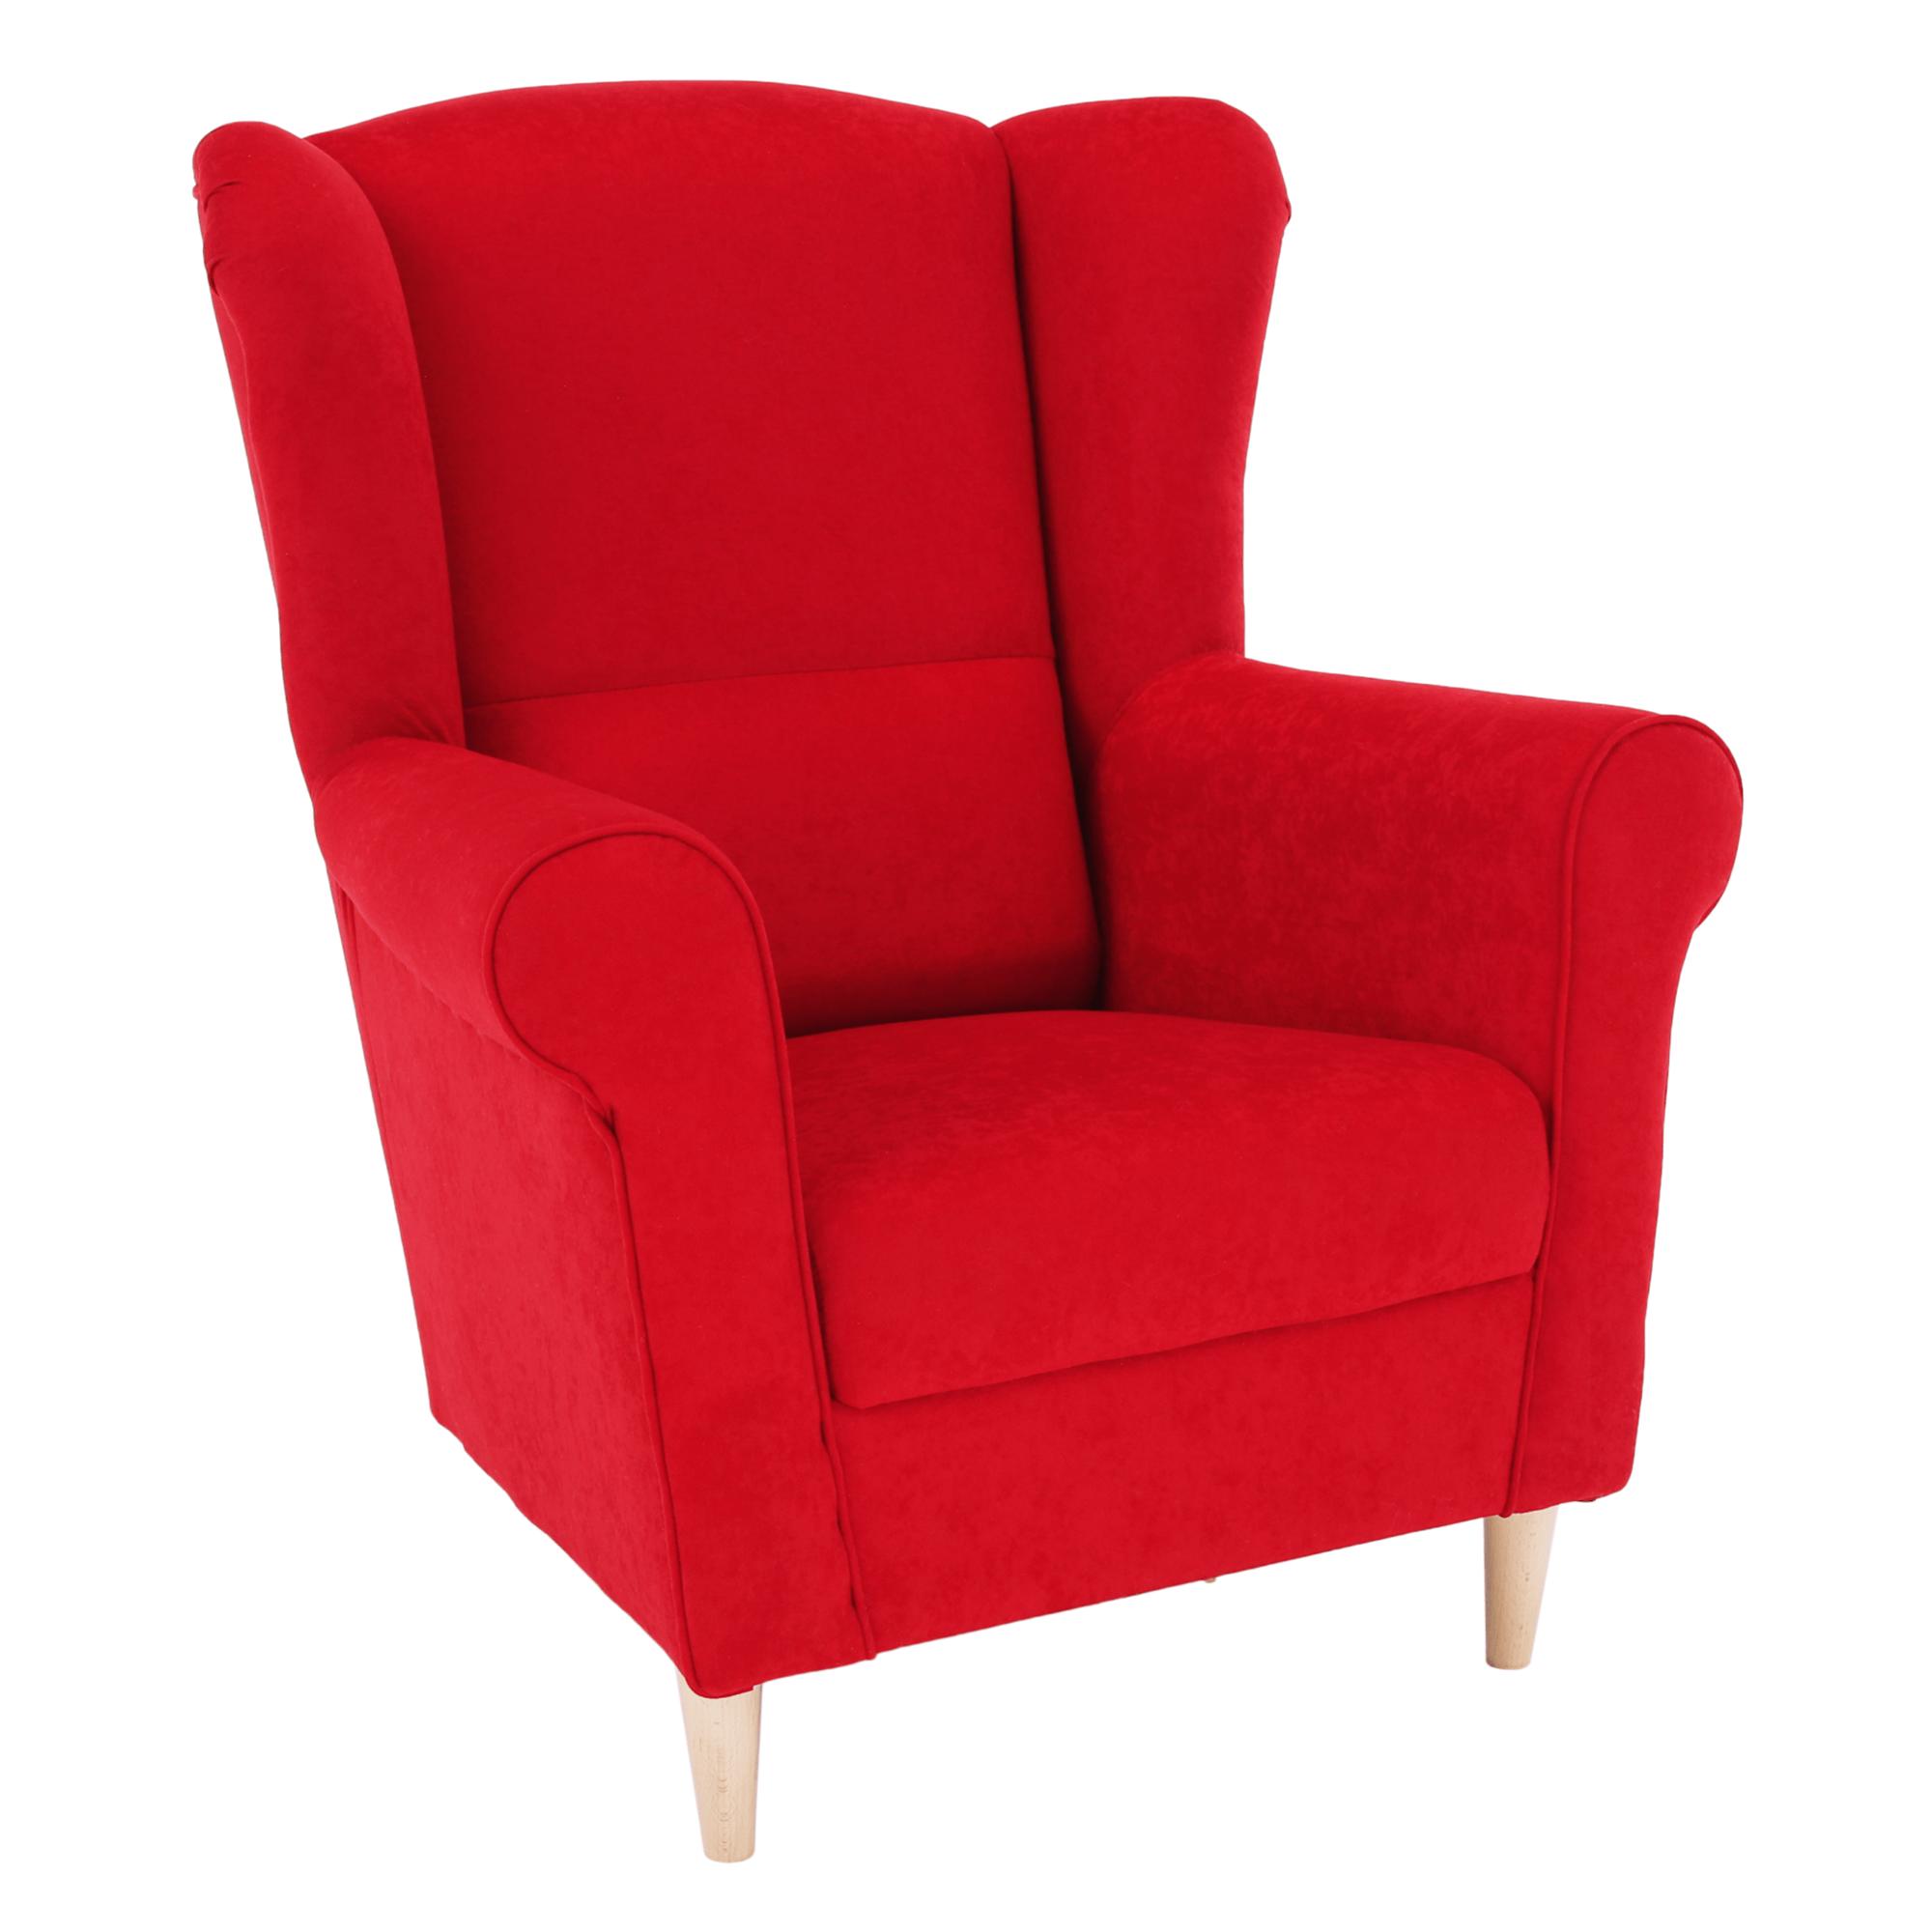 Füles fotel, piros, CHARLOT